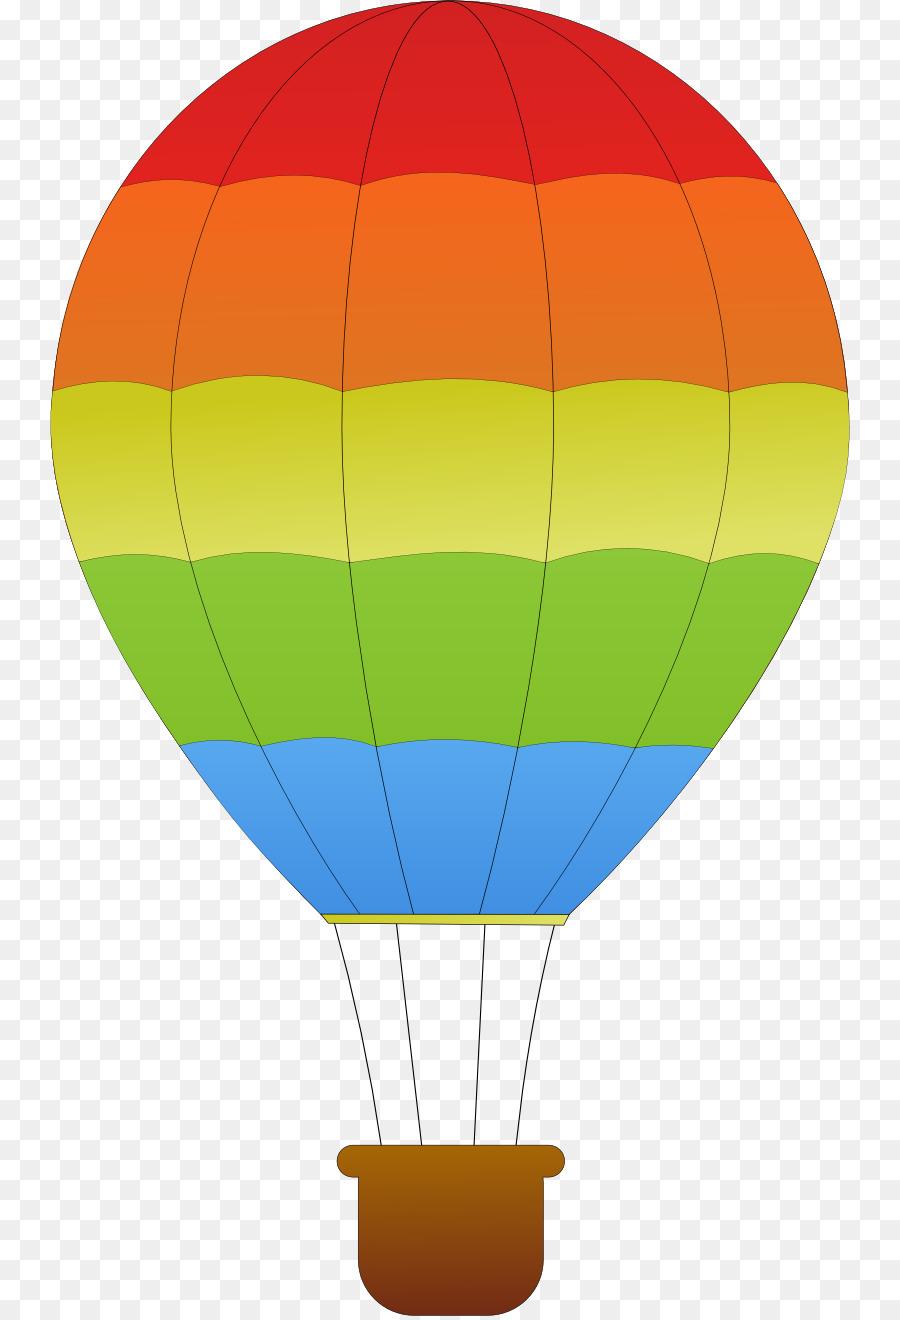 Balon Udara Kartun Png : balon, udara, kartun, Balloon, Watercolor, Download, 800*1316, Transparent, Download., CleanPNG, KissPNG